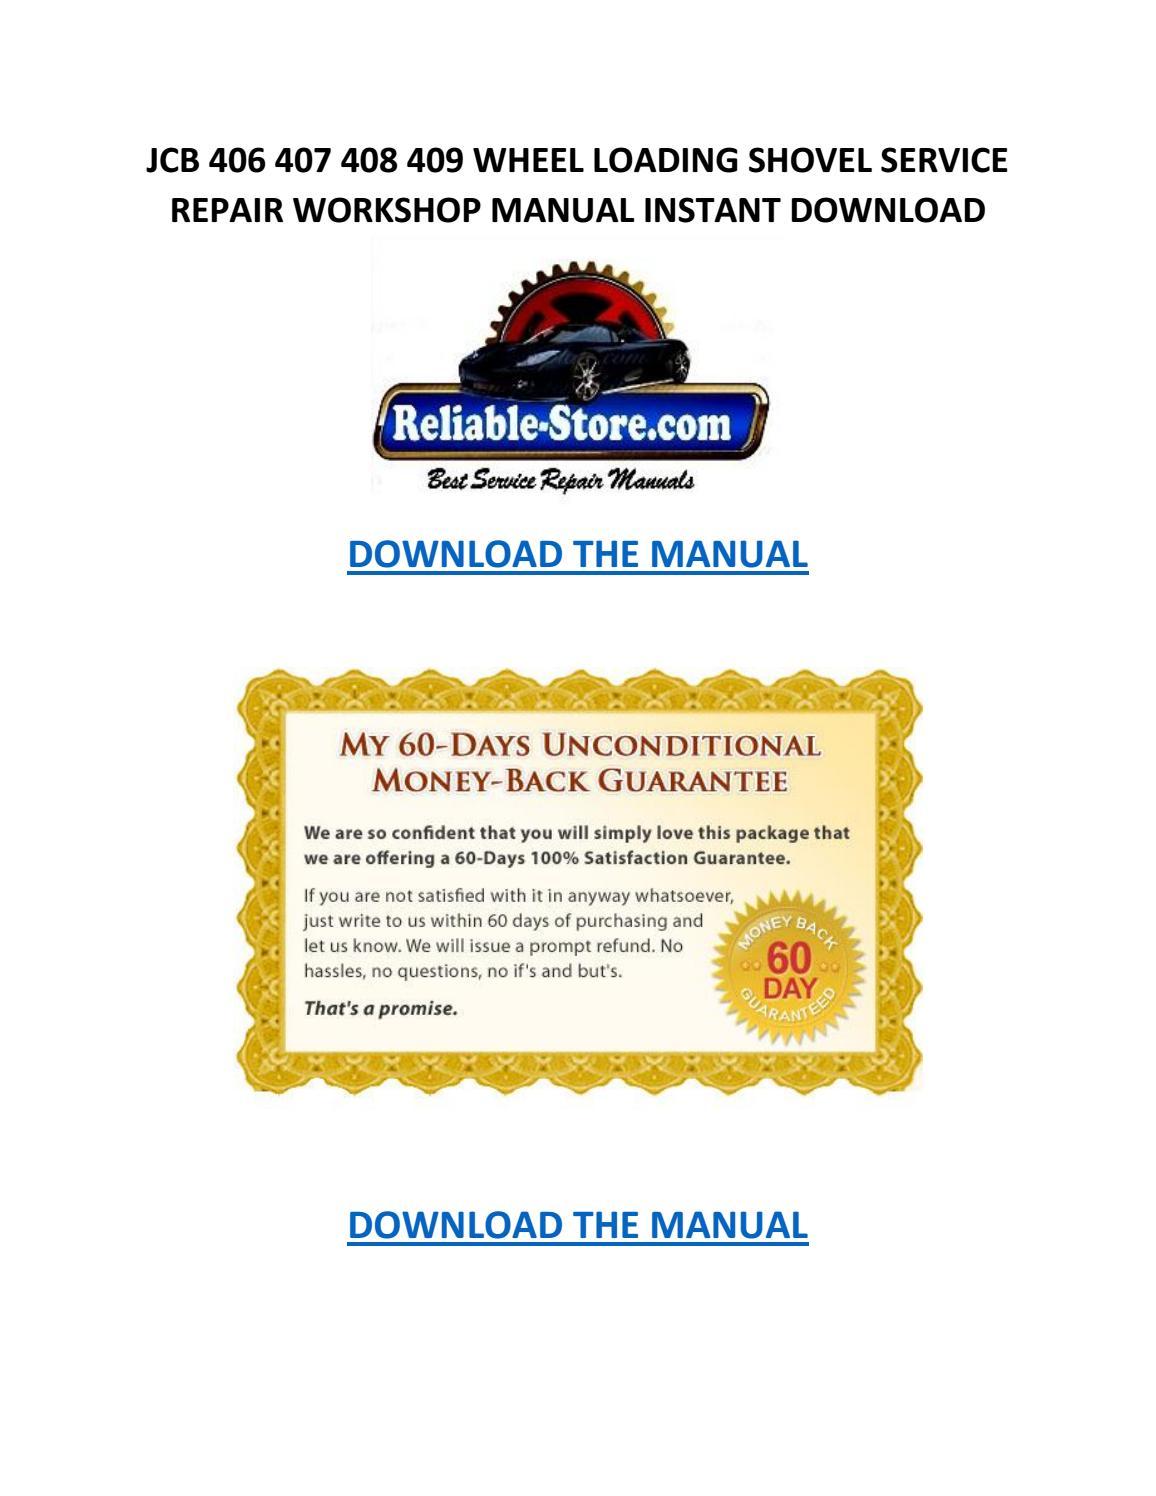 Jcb 406 407 408 409 wheel loading shovel service repair workshop manual  instant download by Willie Blakely - issuu